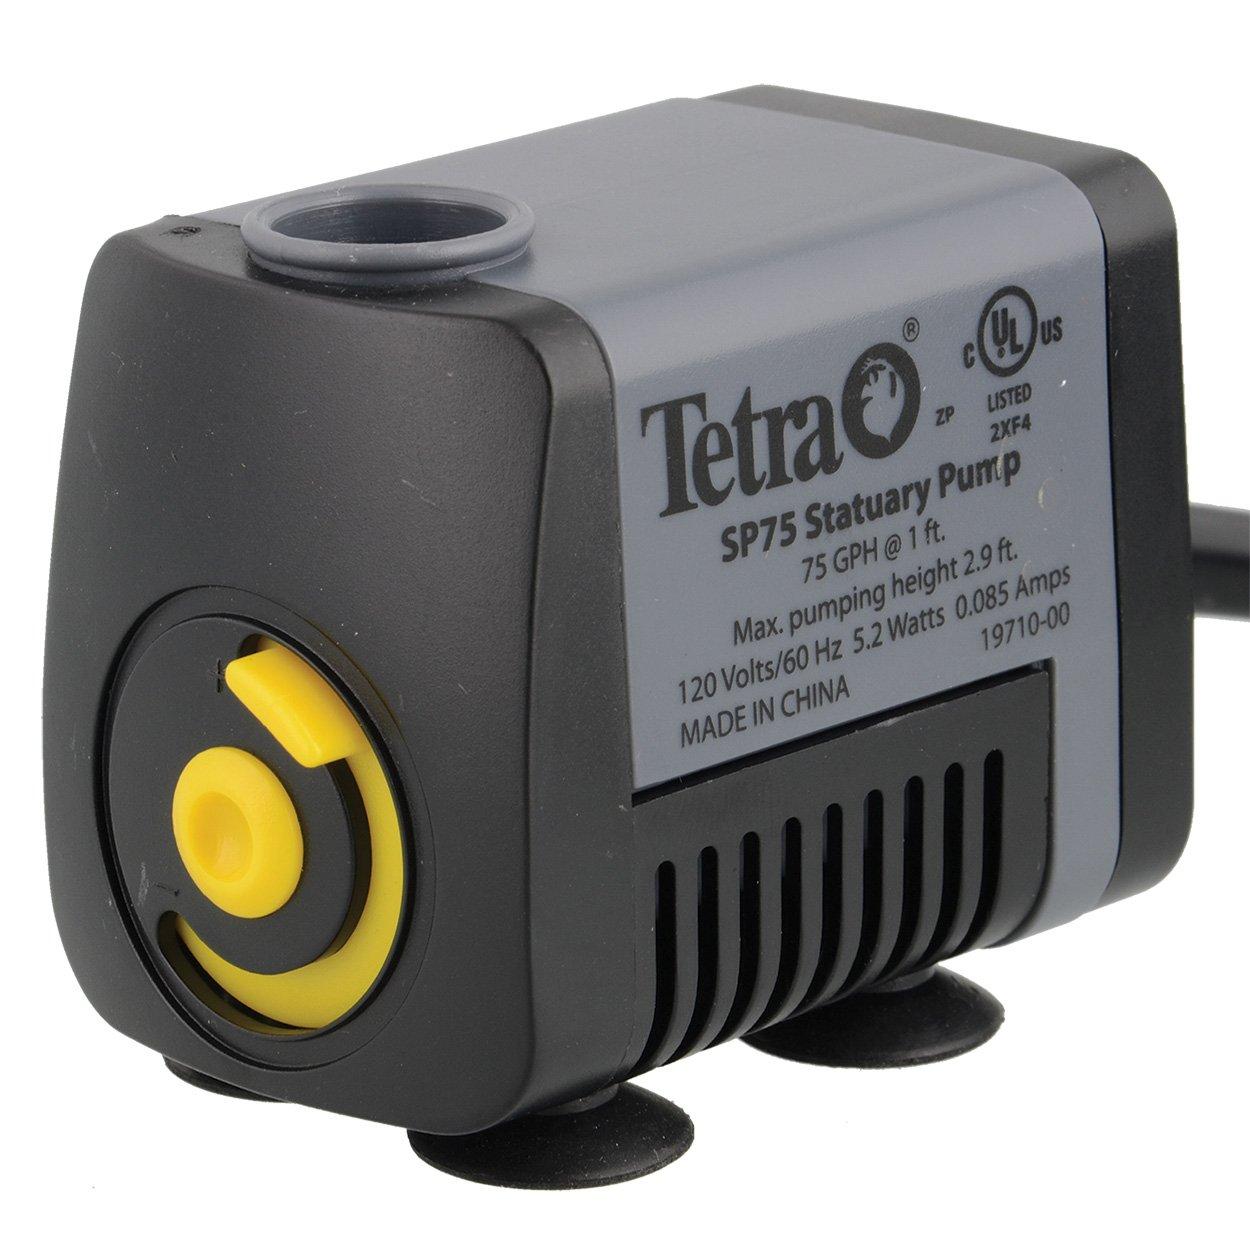 Tetra Pond 14938 Statuary 75 GPH Pump